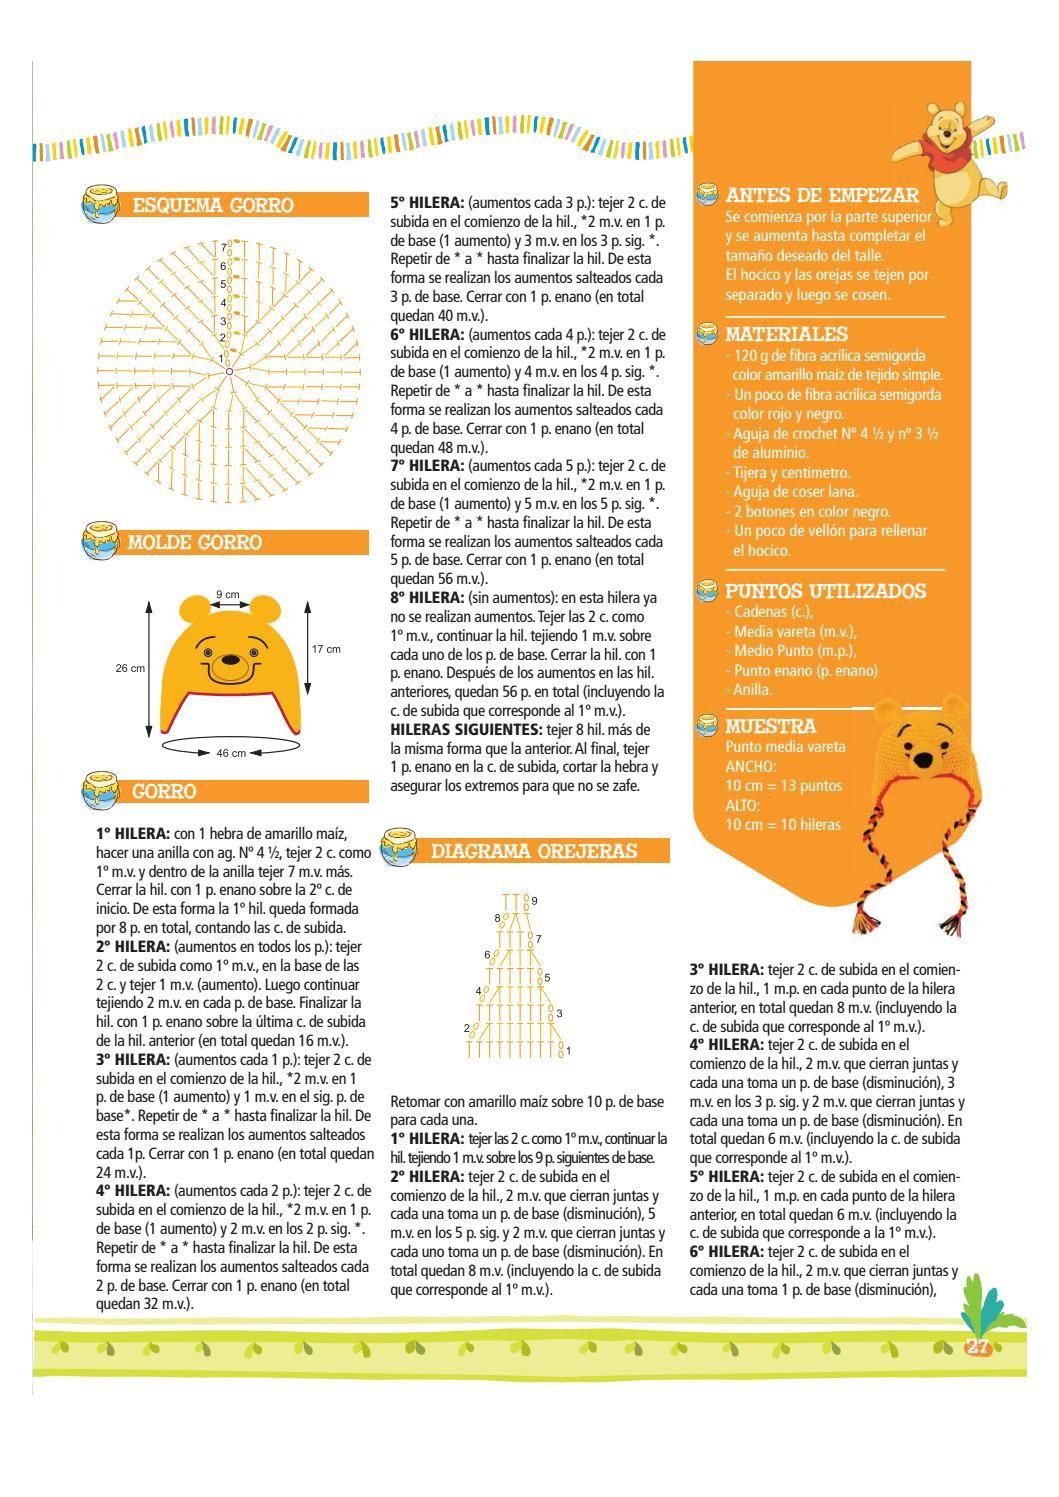 Pin de Isabel Nemet en Disfraces y Gorros personajes | Pinterest ...